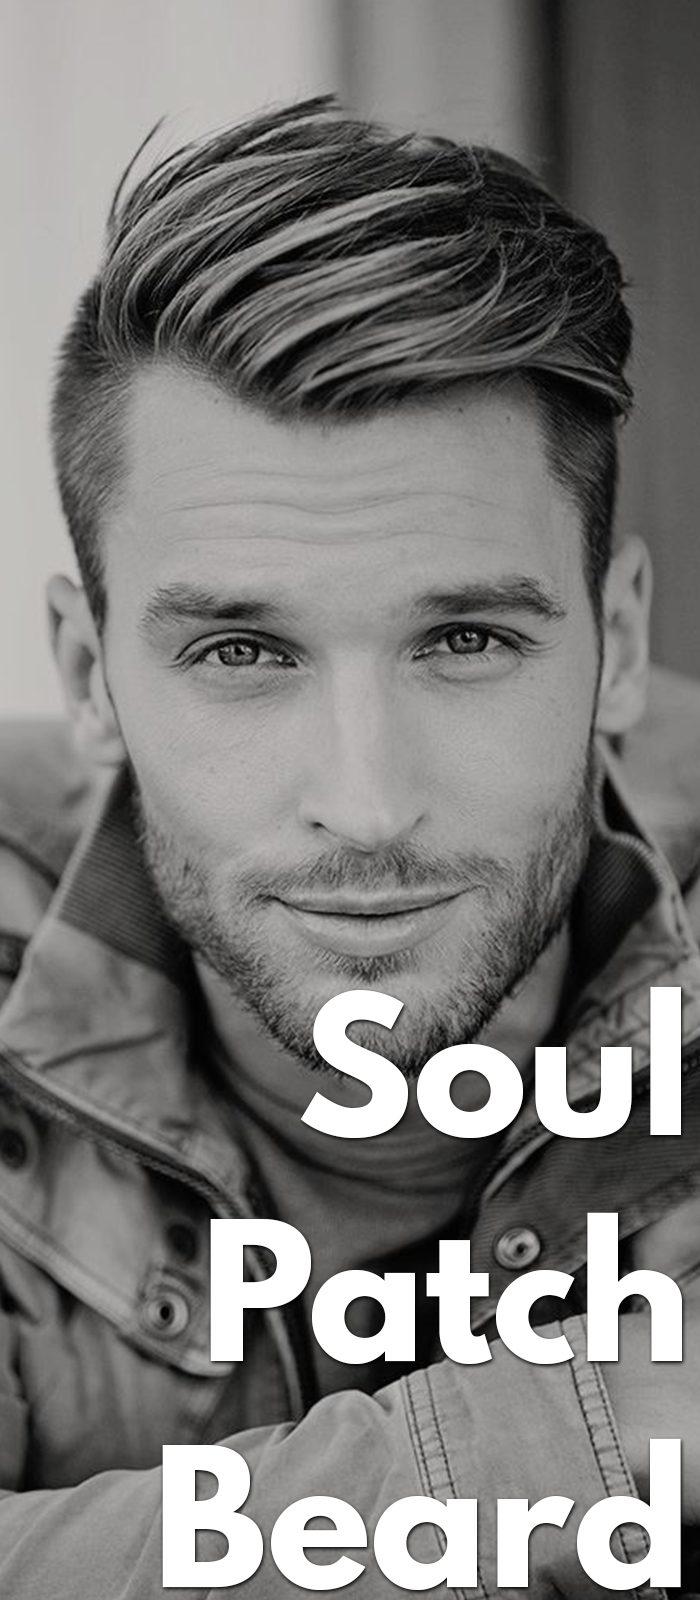 Soul-Patch-Beard.